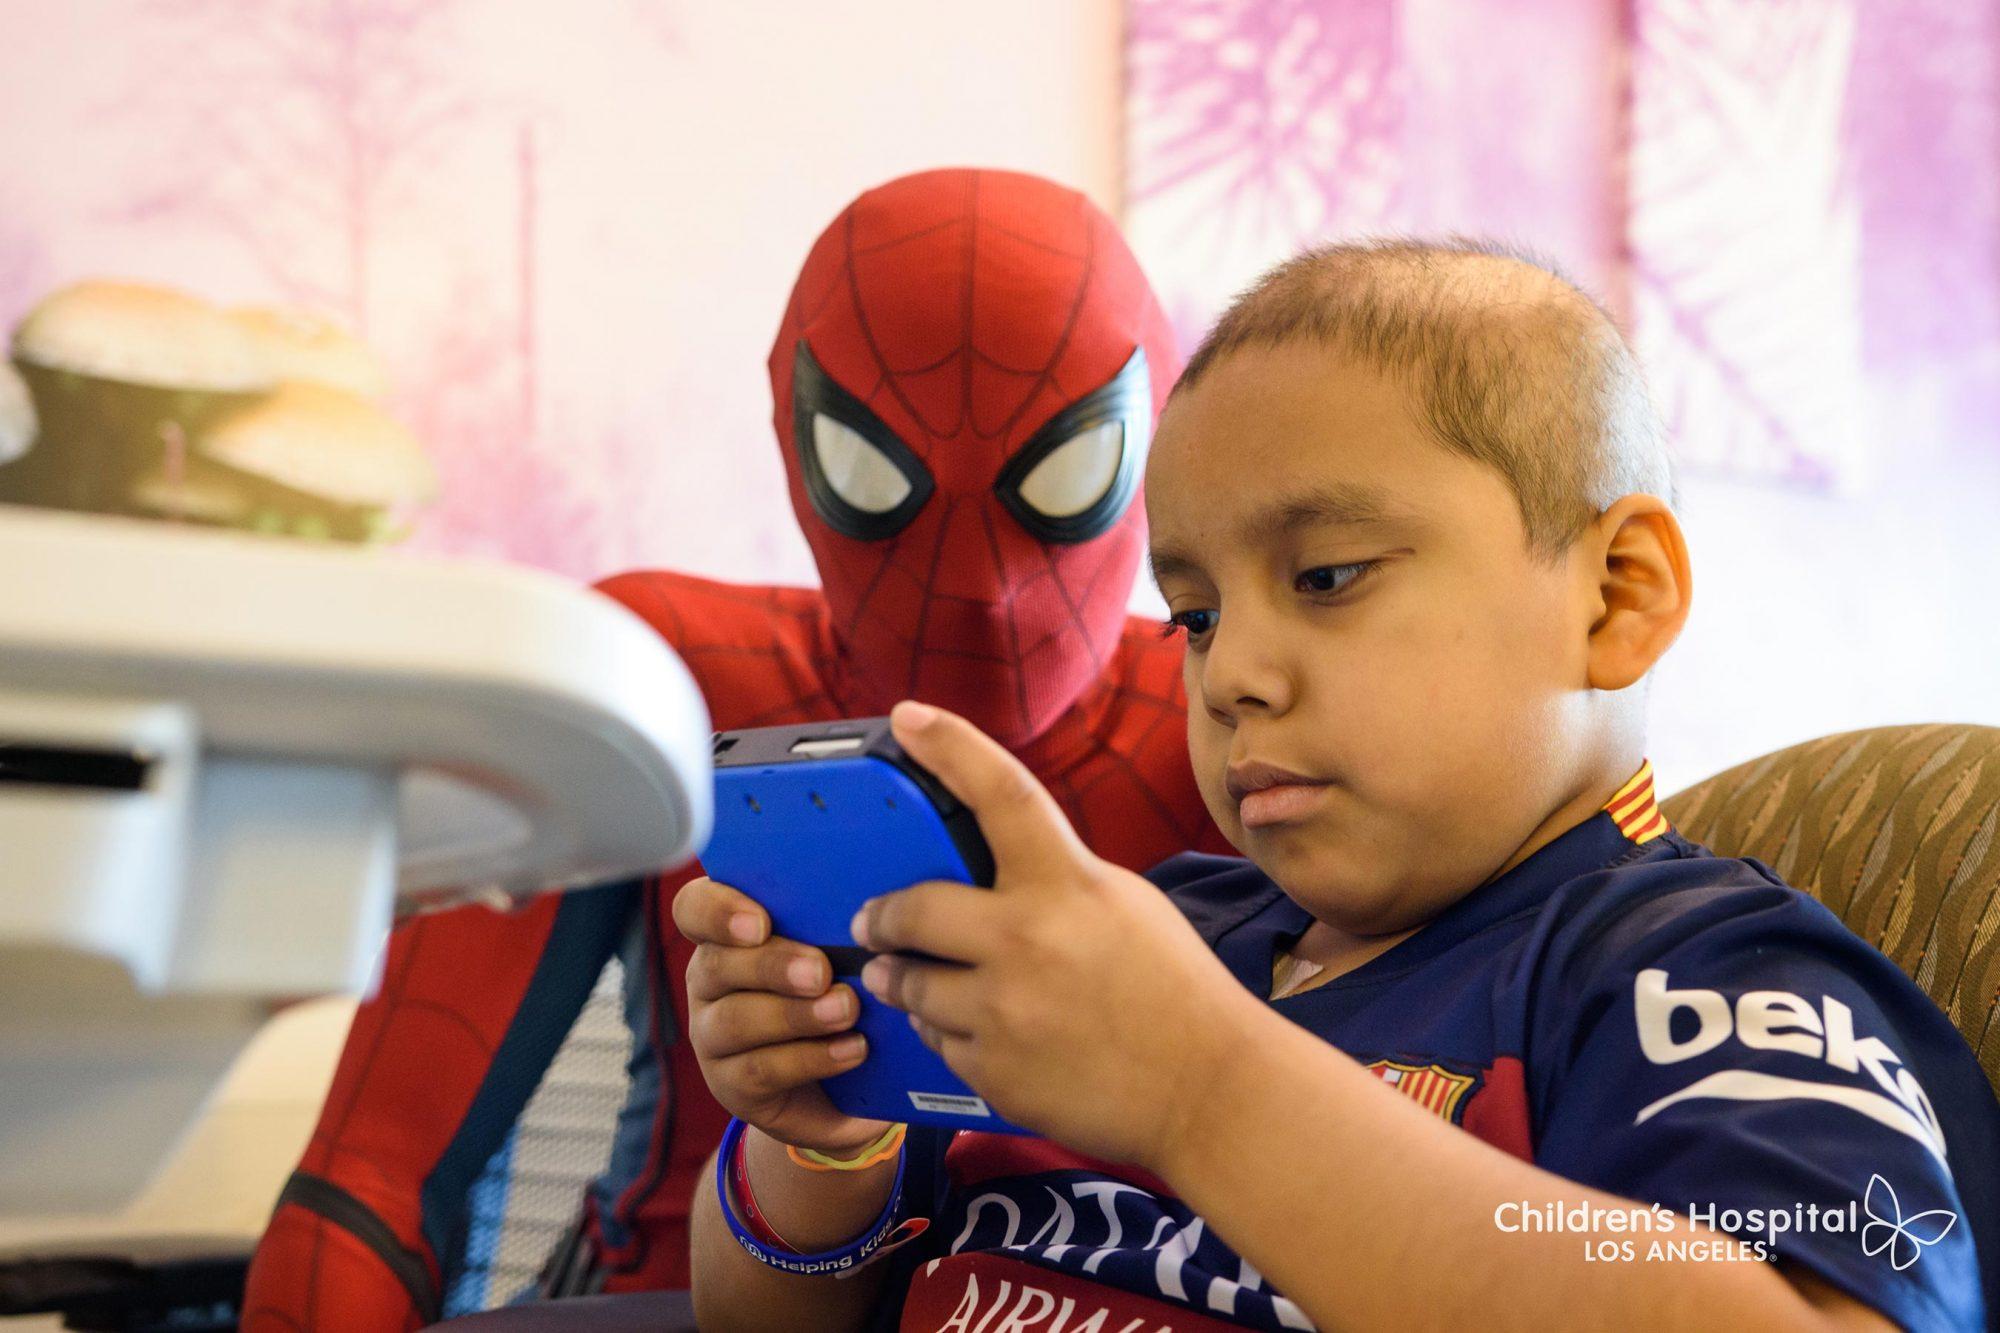 TomHolland-Spiderman-2017-5-15-wm-0156